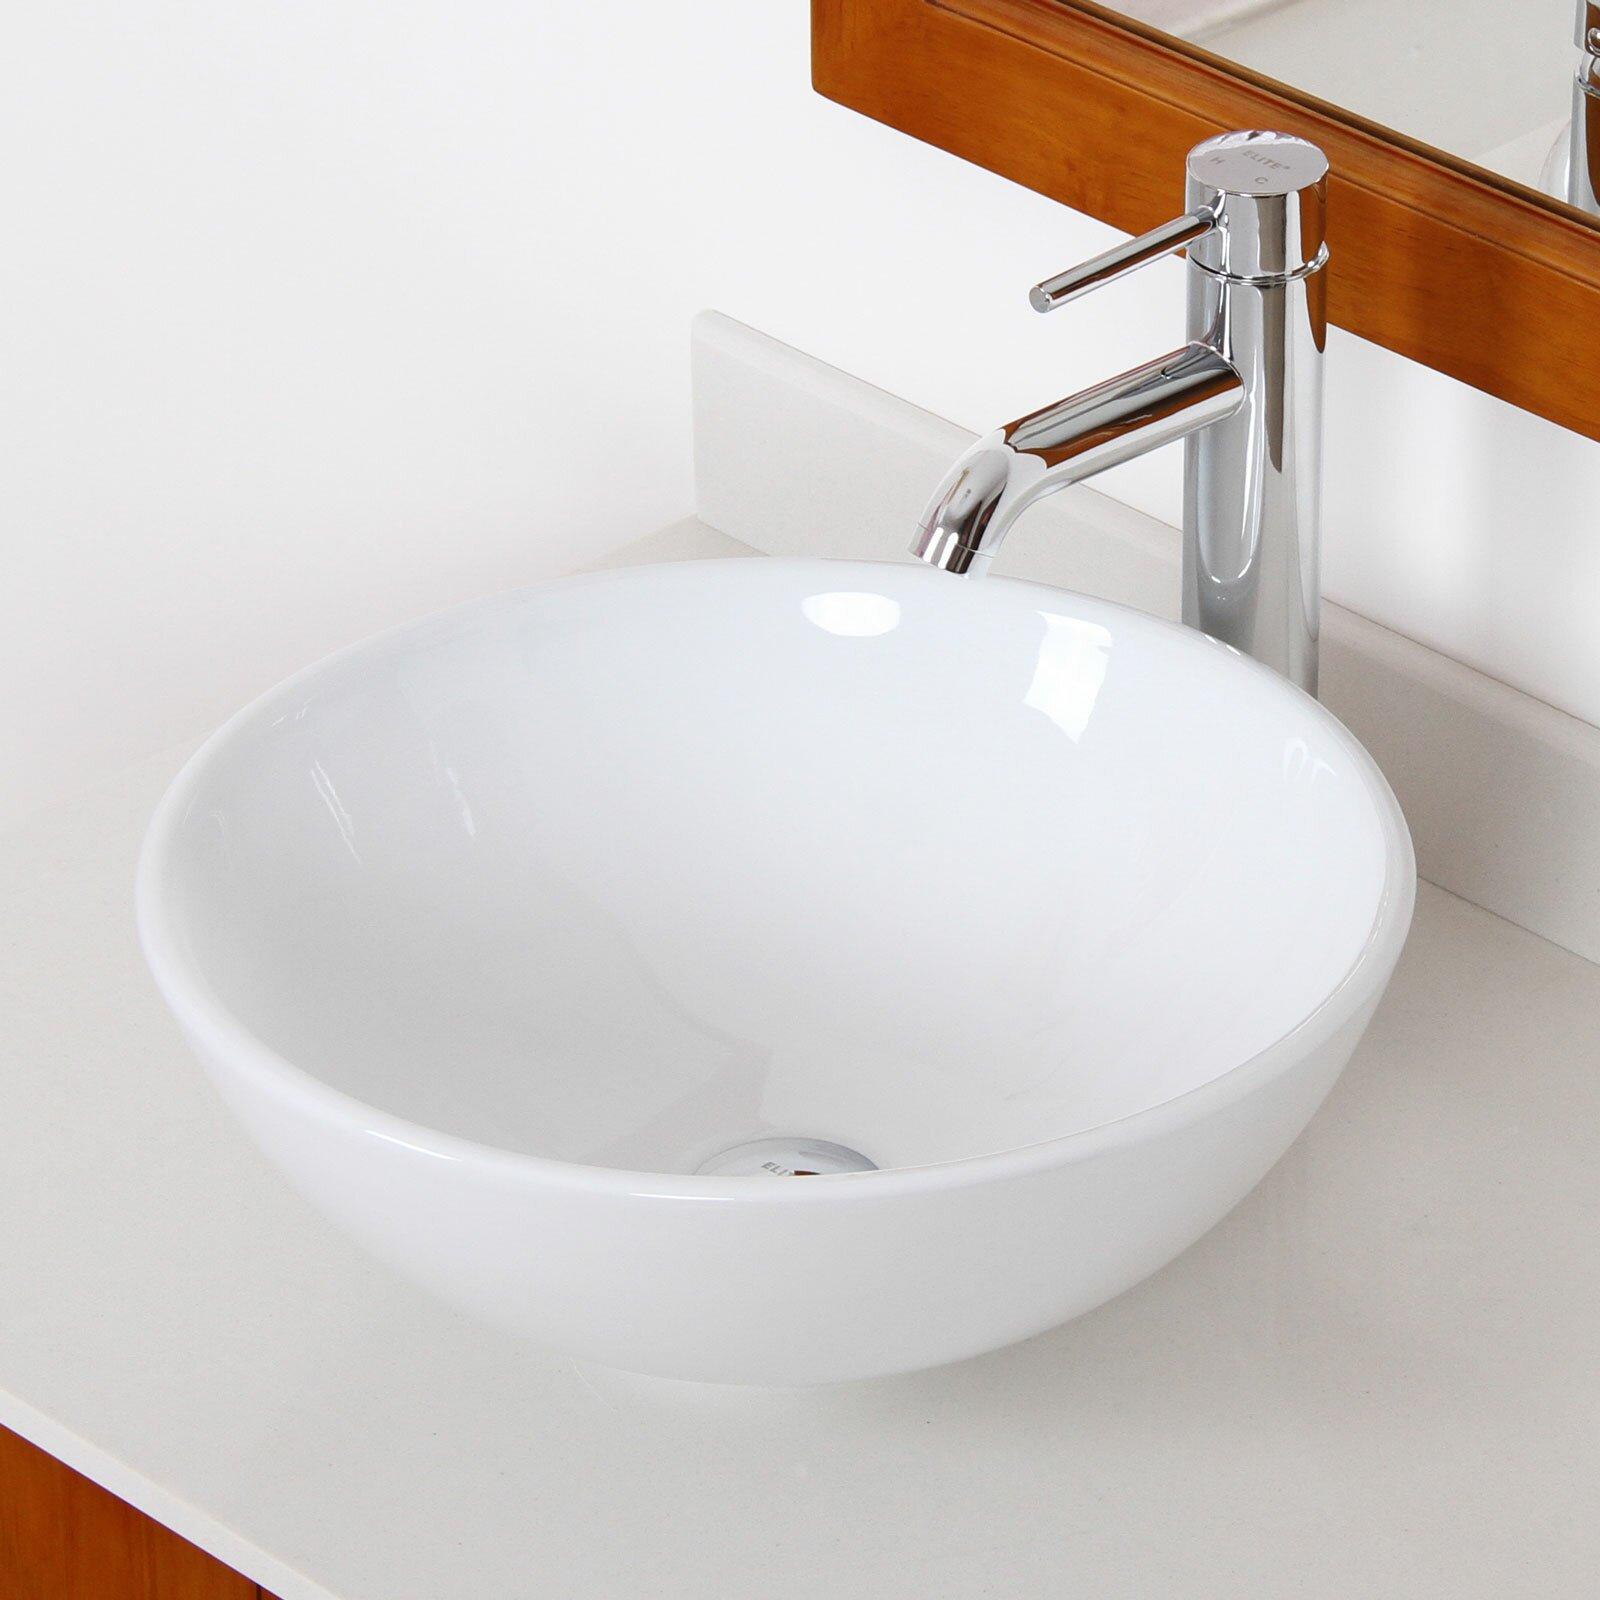 Round Bathroom Sinks: Elite Ceramic Round Bathroom Sink & Reviews